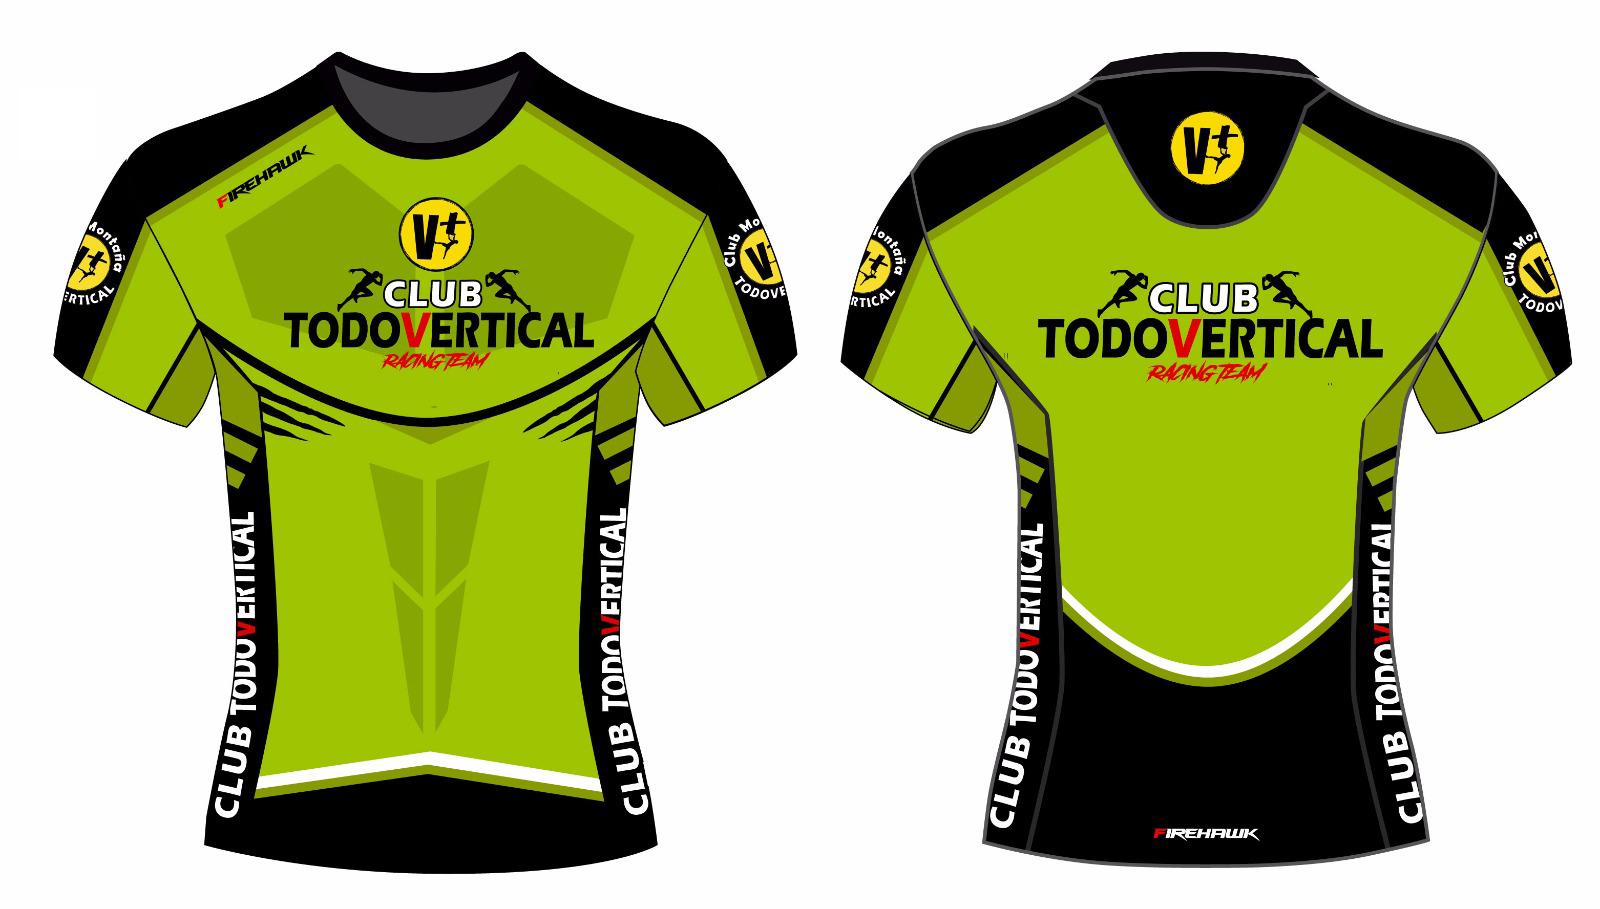 Camiseta personalizada Running Team V+